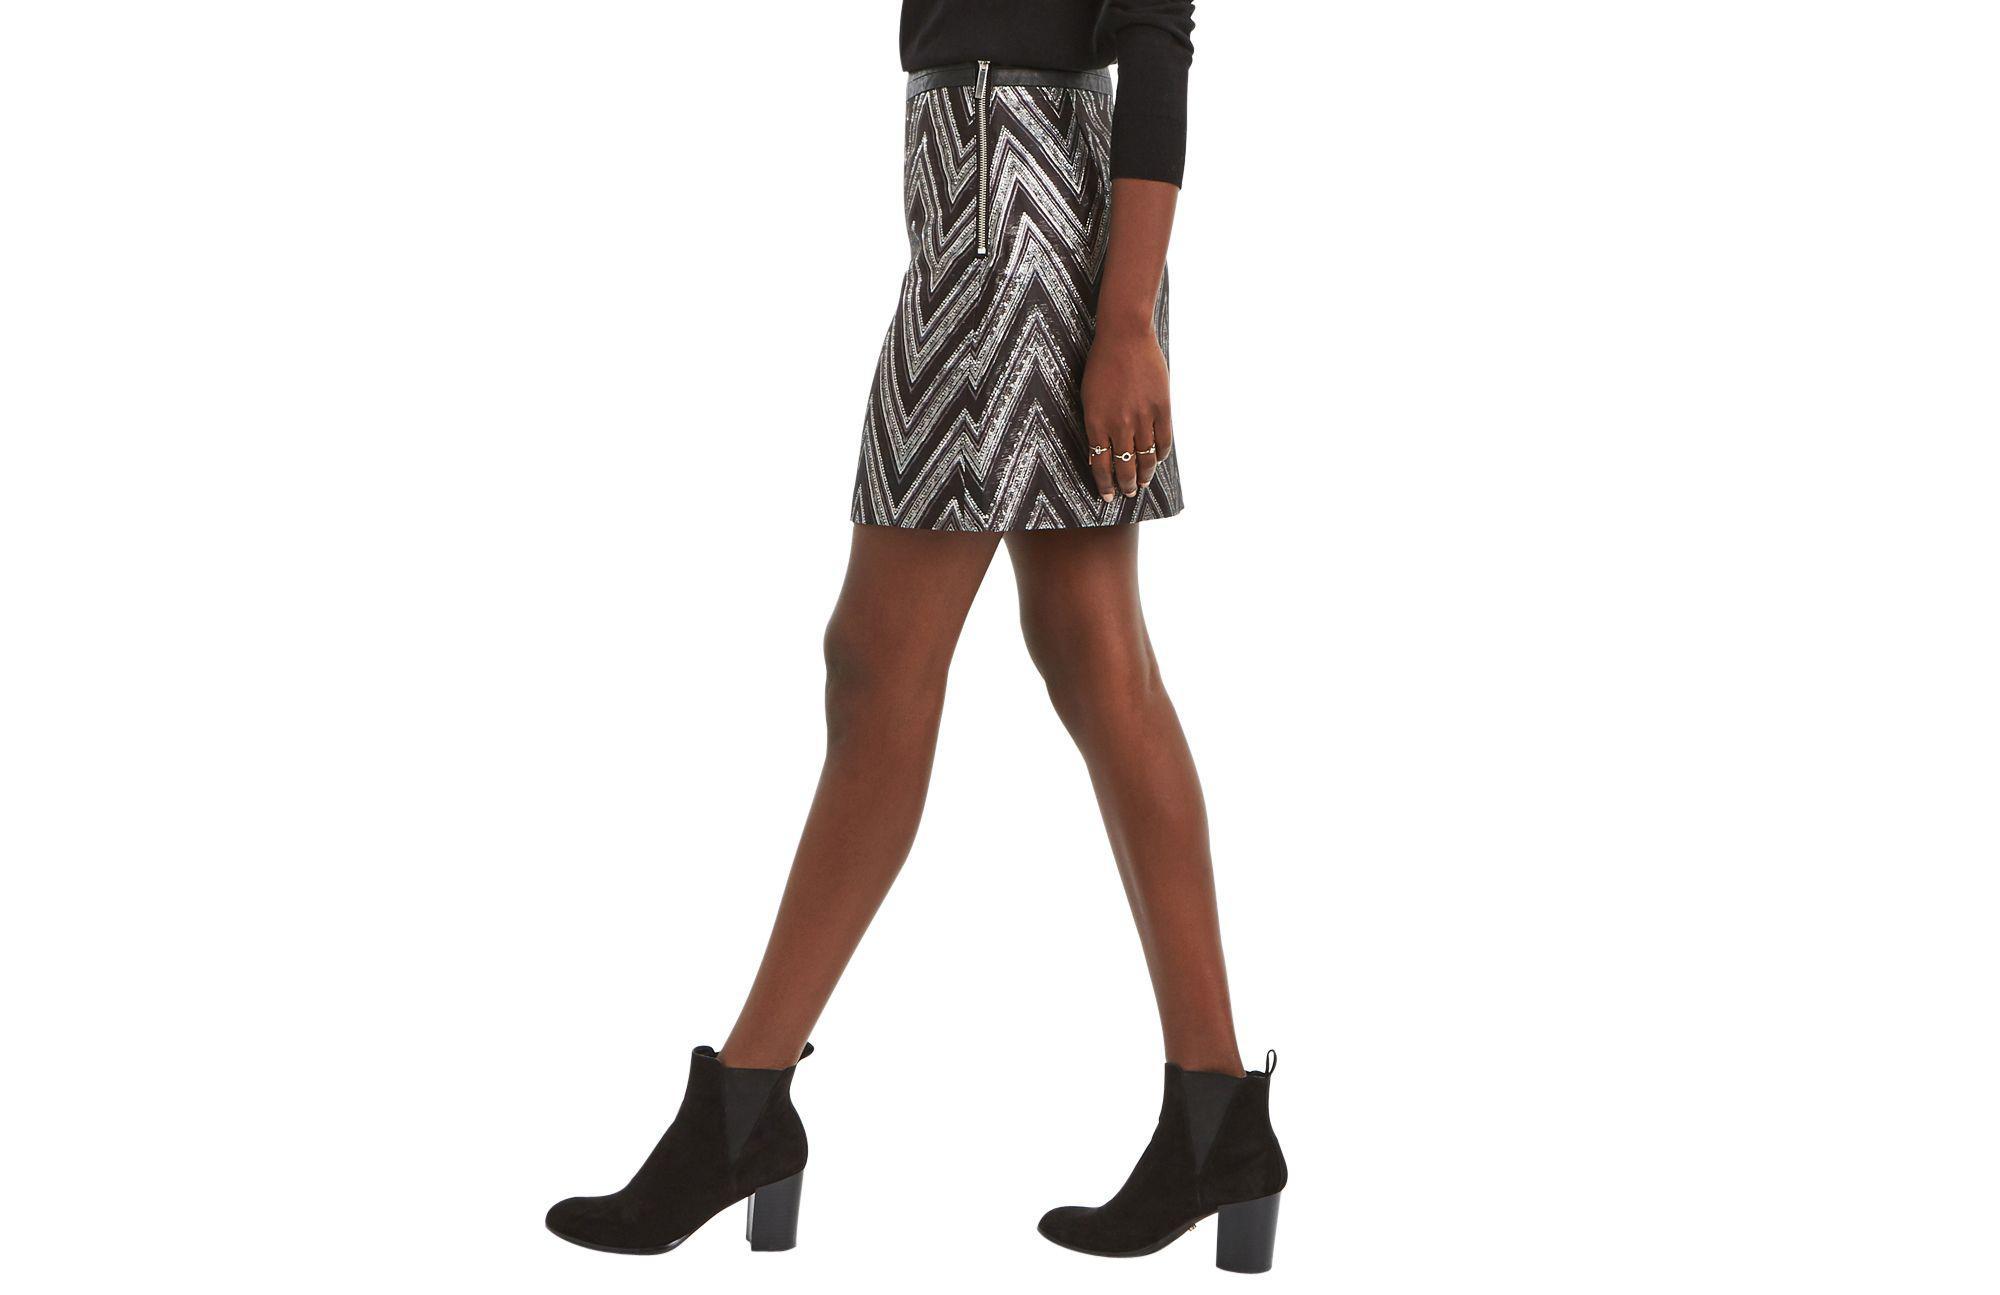 ce3d1a35e01e Oasis Multi Silver Zigzag Jacquard Marley Mini Skirt in Black - Lyst